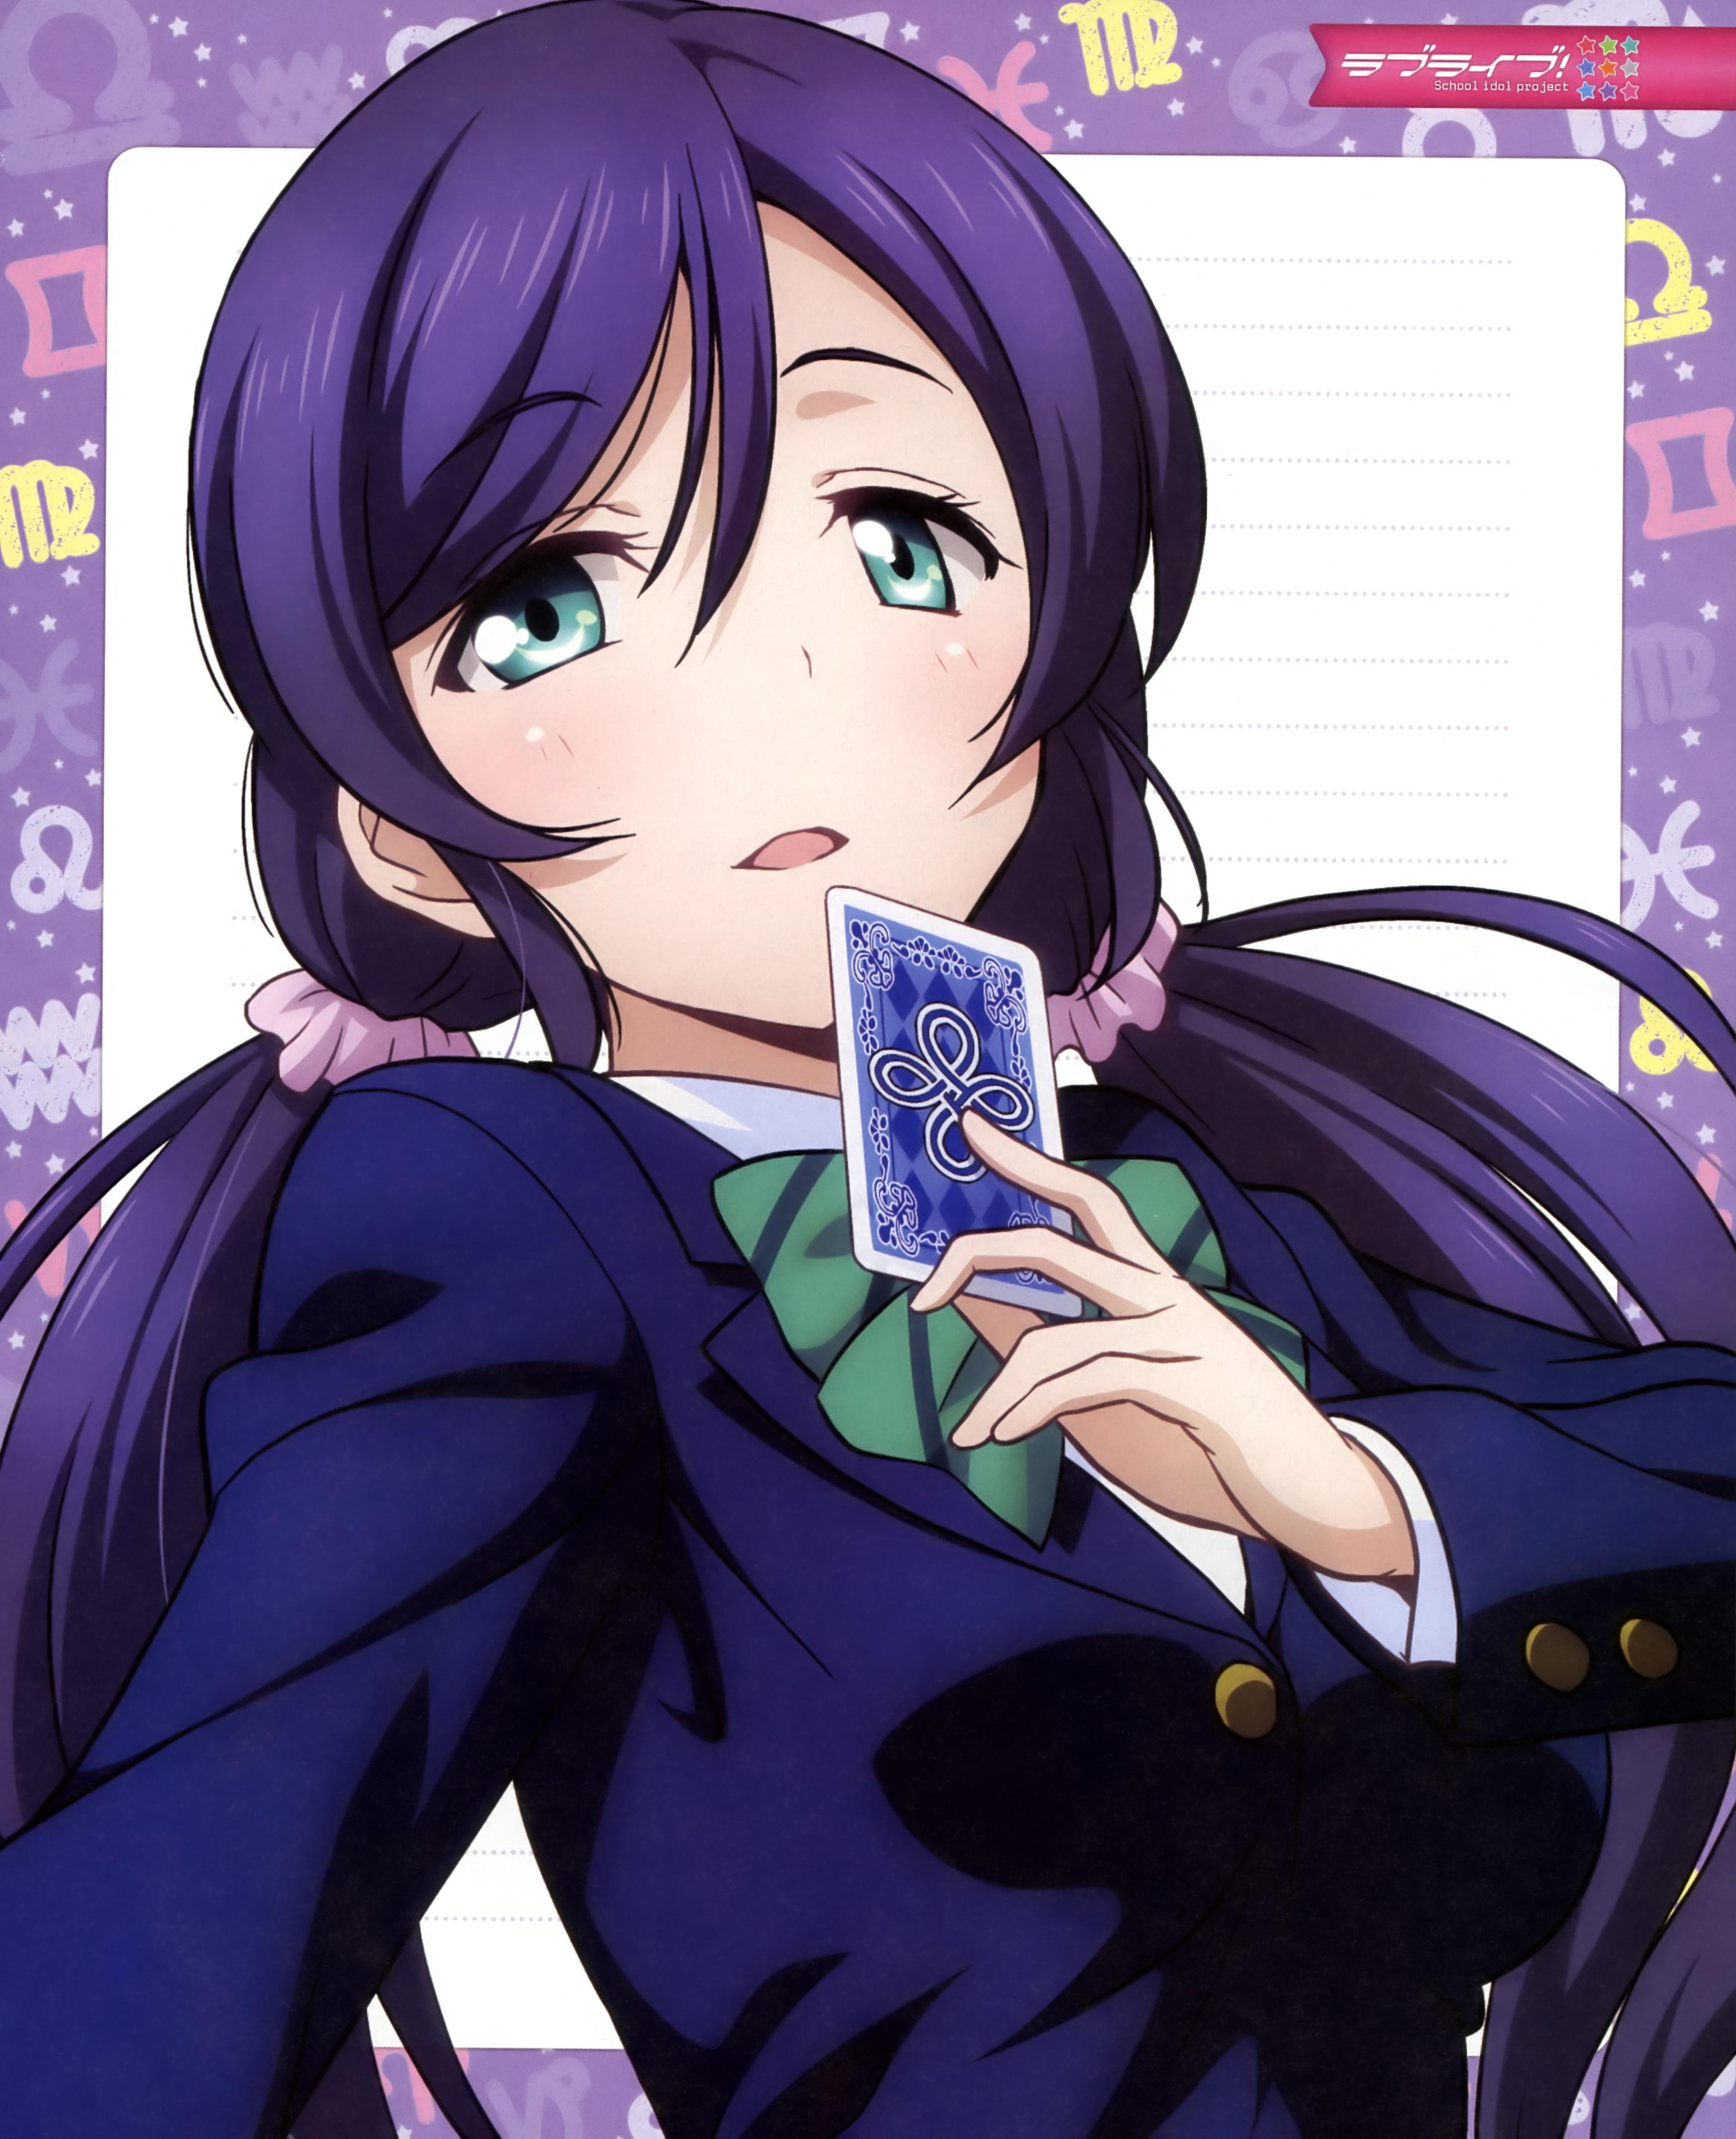 Toujou Nozomi Image #1669553 - Zerochan Anime Image Board